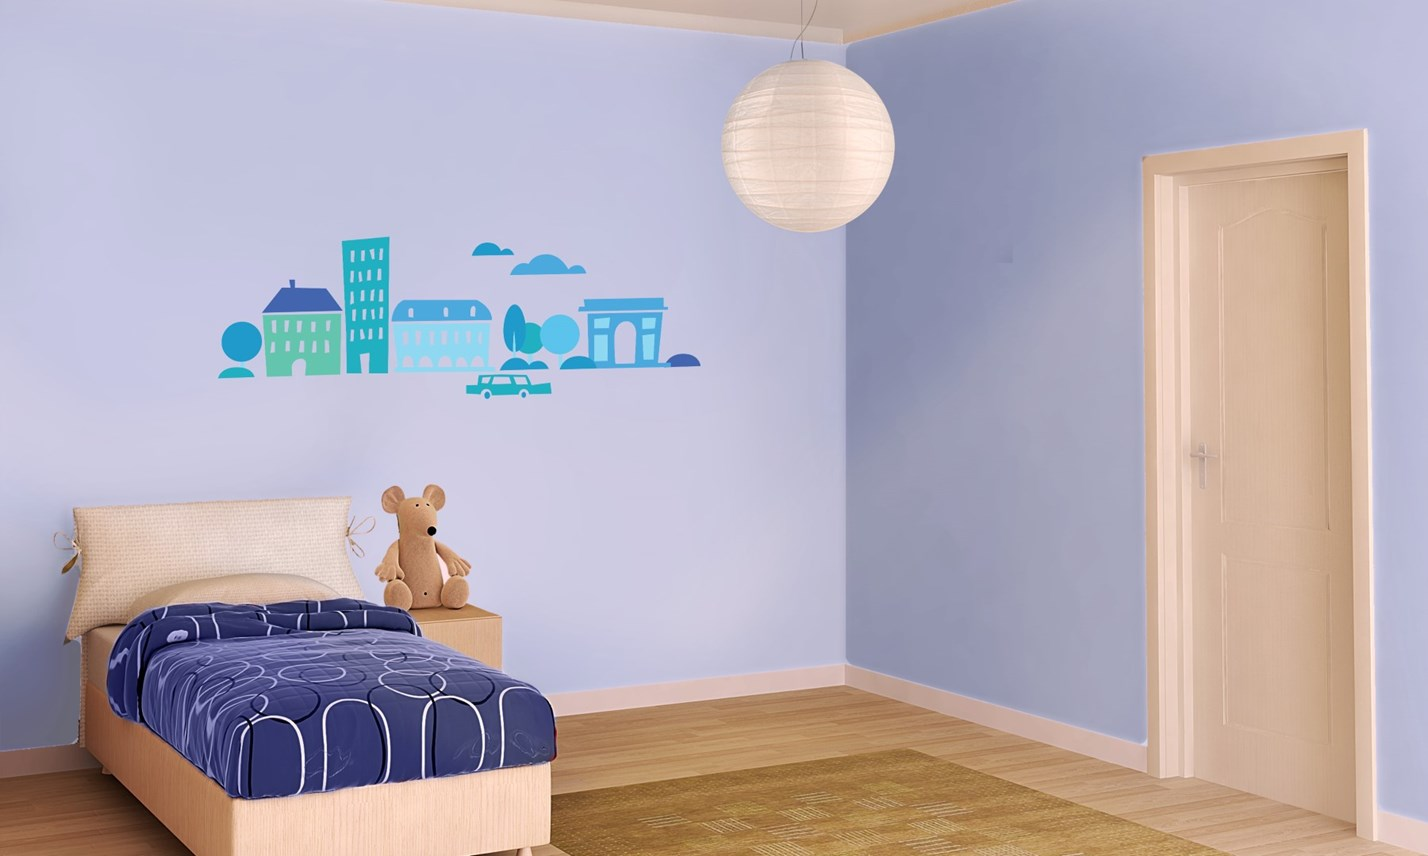 Stanze bambini best image with stanze bambini cheap for Decora la stanza girlsgogames